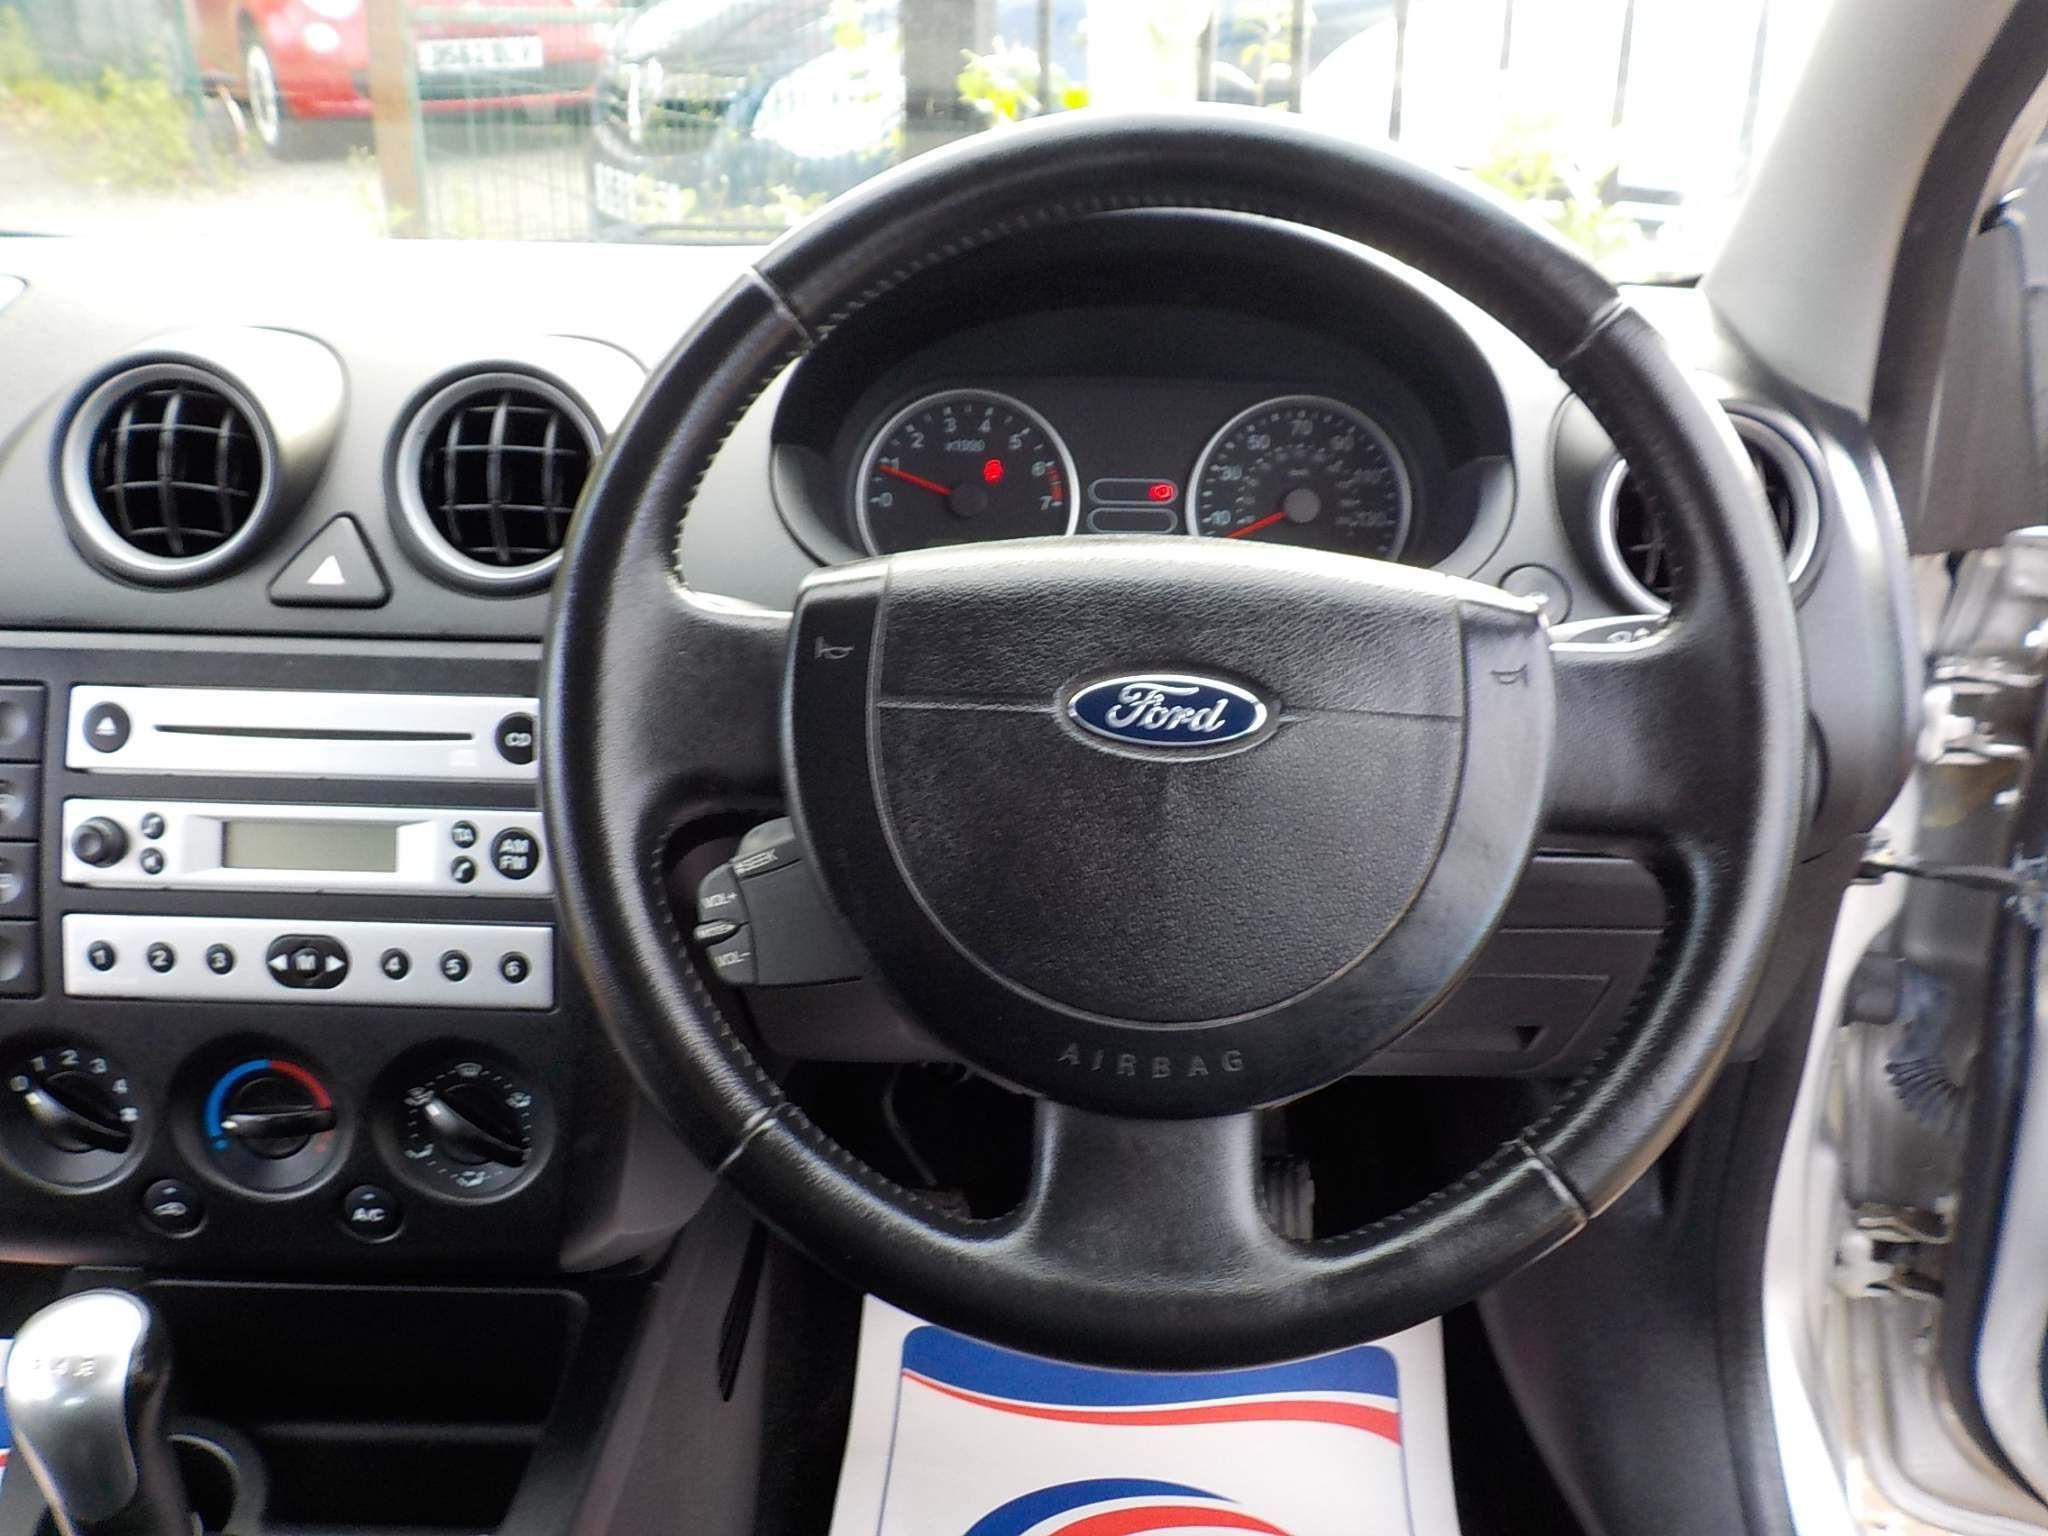 Ford Fiesta 1.4 Ghia 5dr